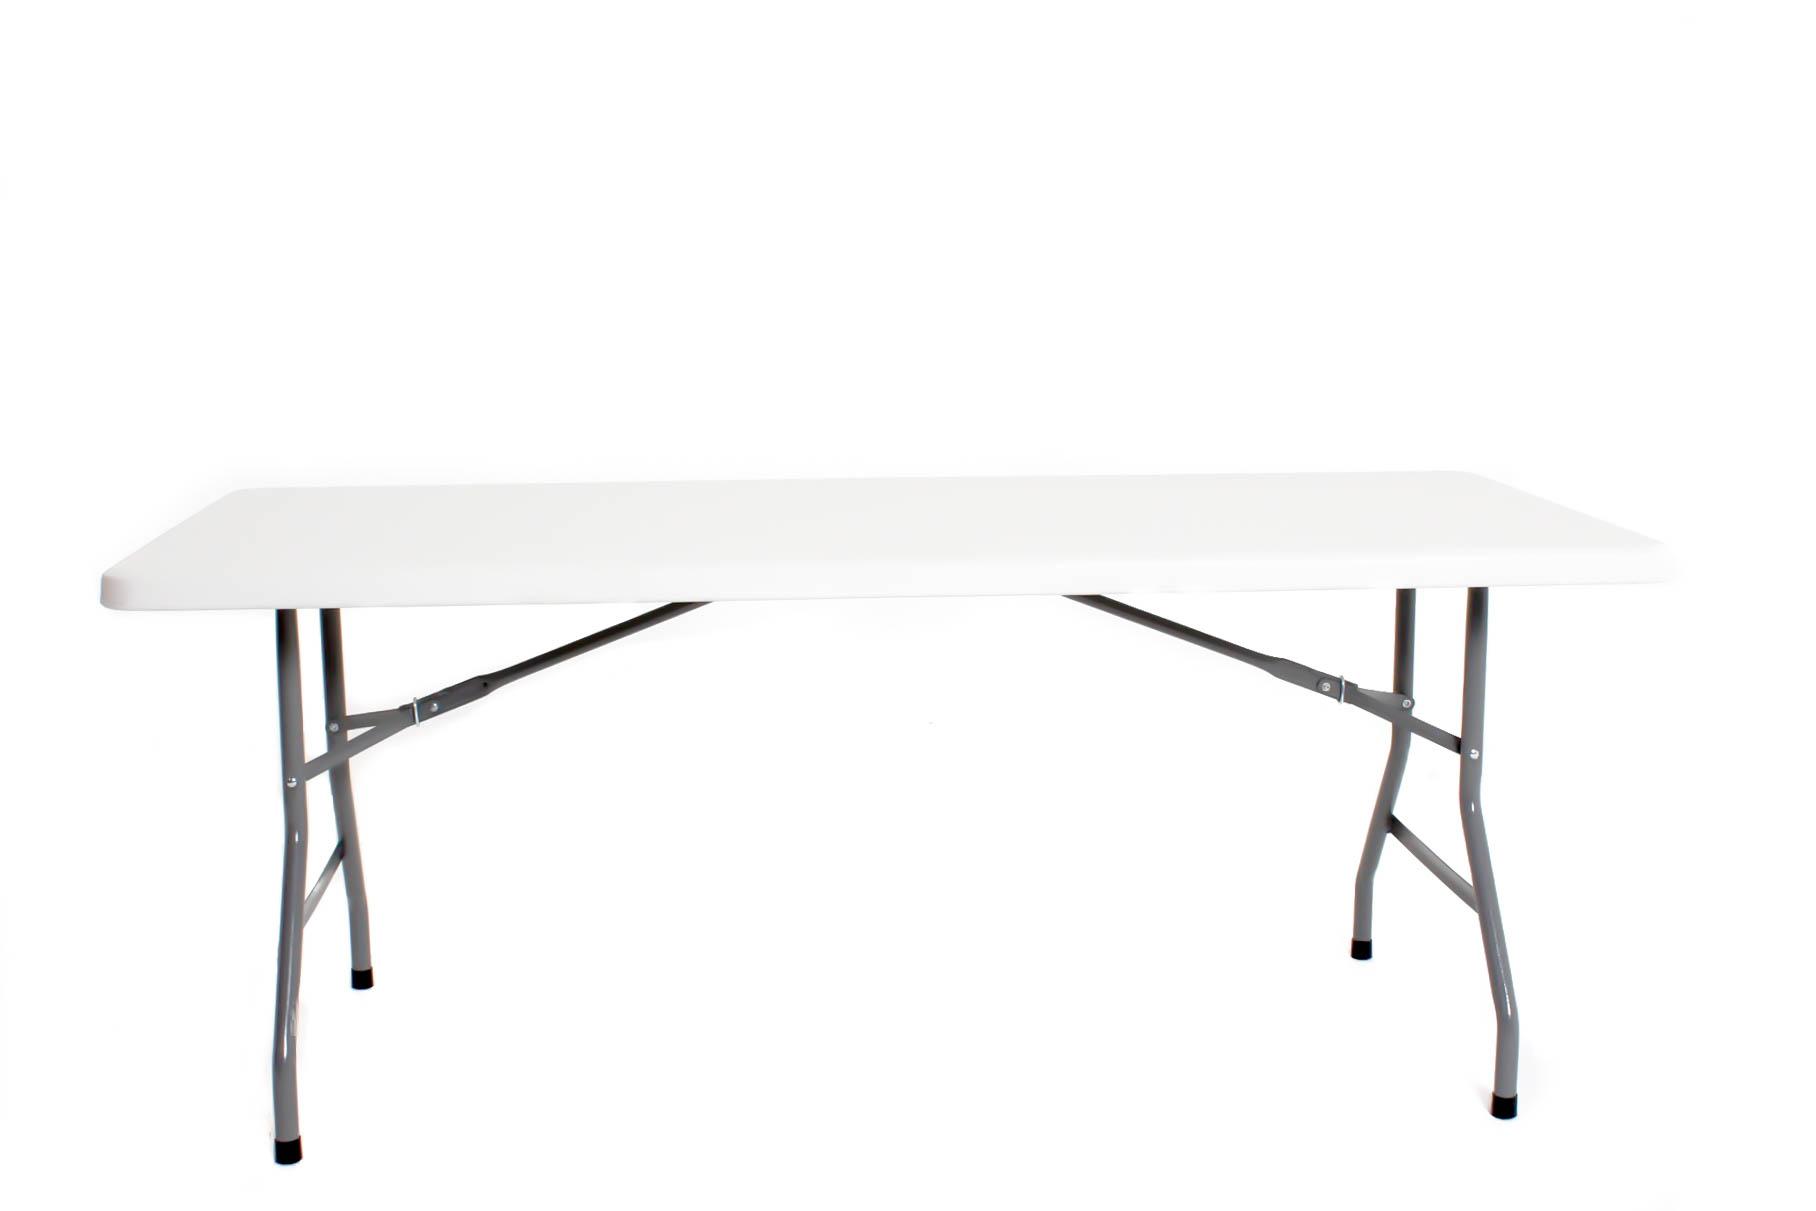 Phenomenal 6Ft Folding Exhibition Table Spiritservingveterans Wood Chair Design Ideas Spiritservingveteransorg